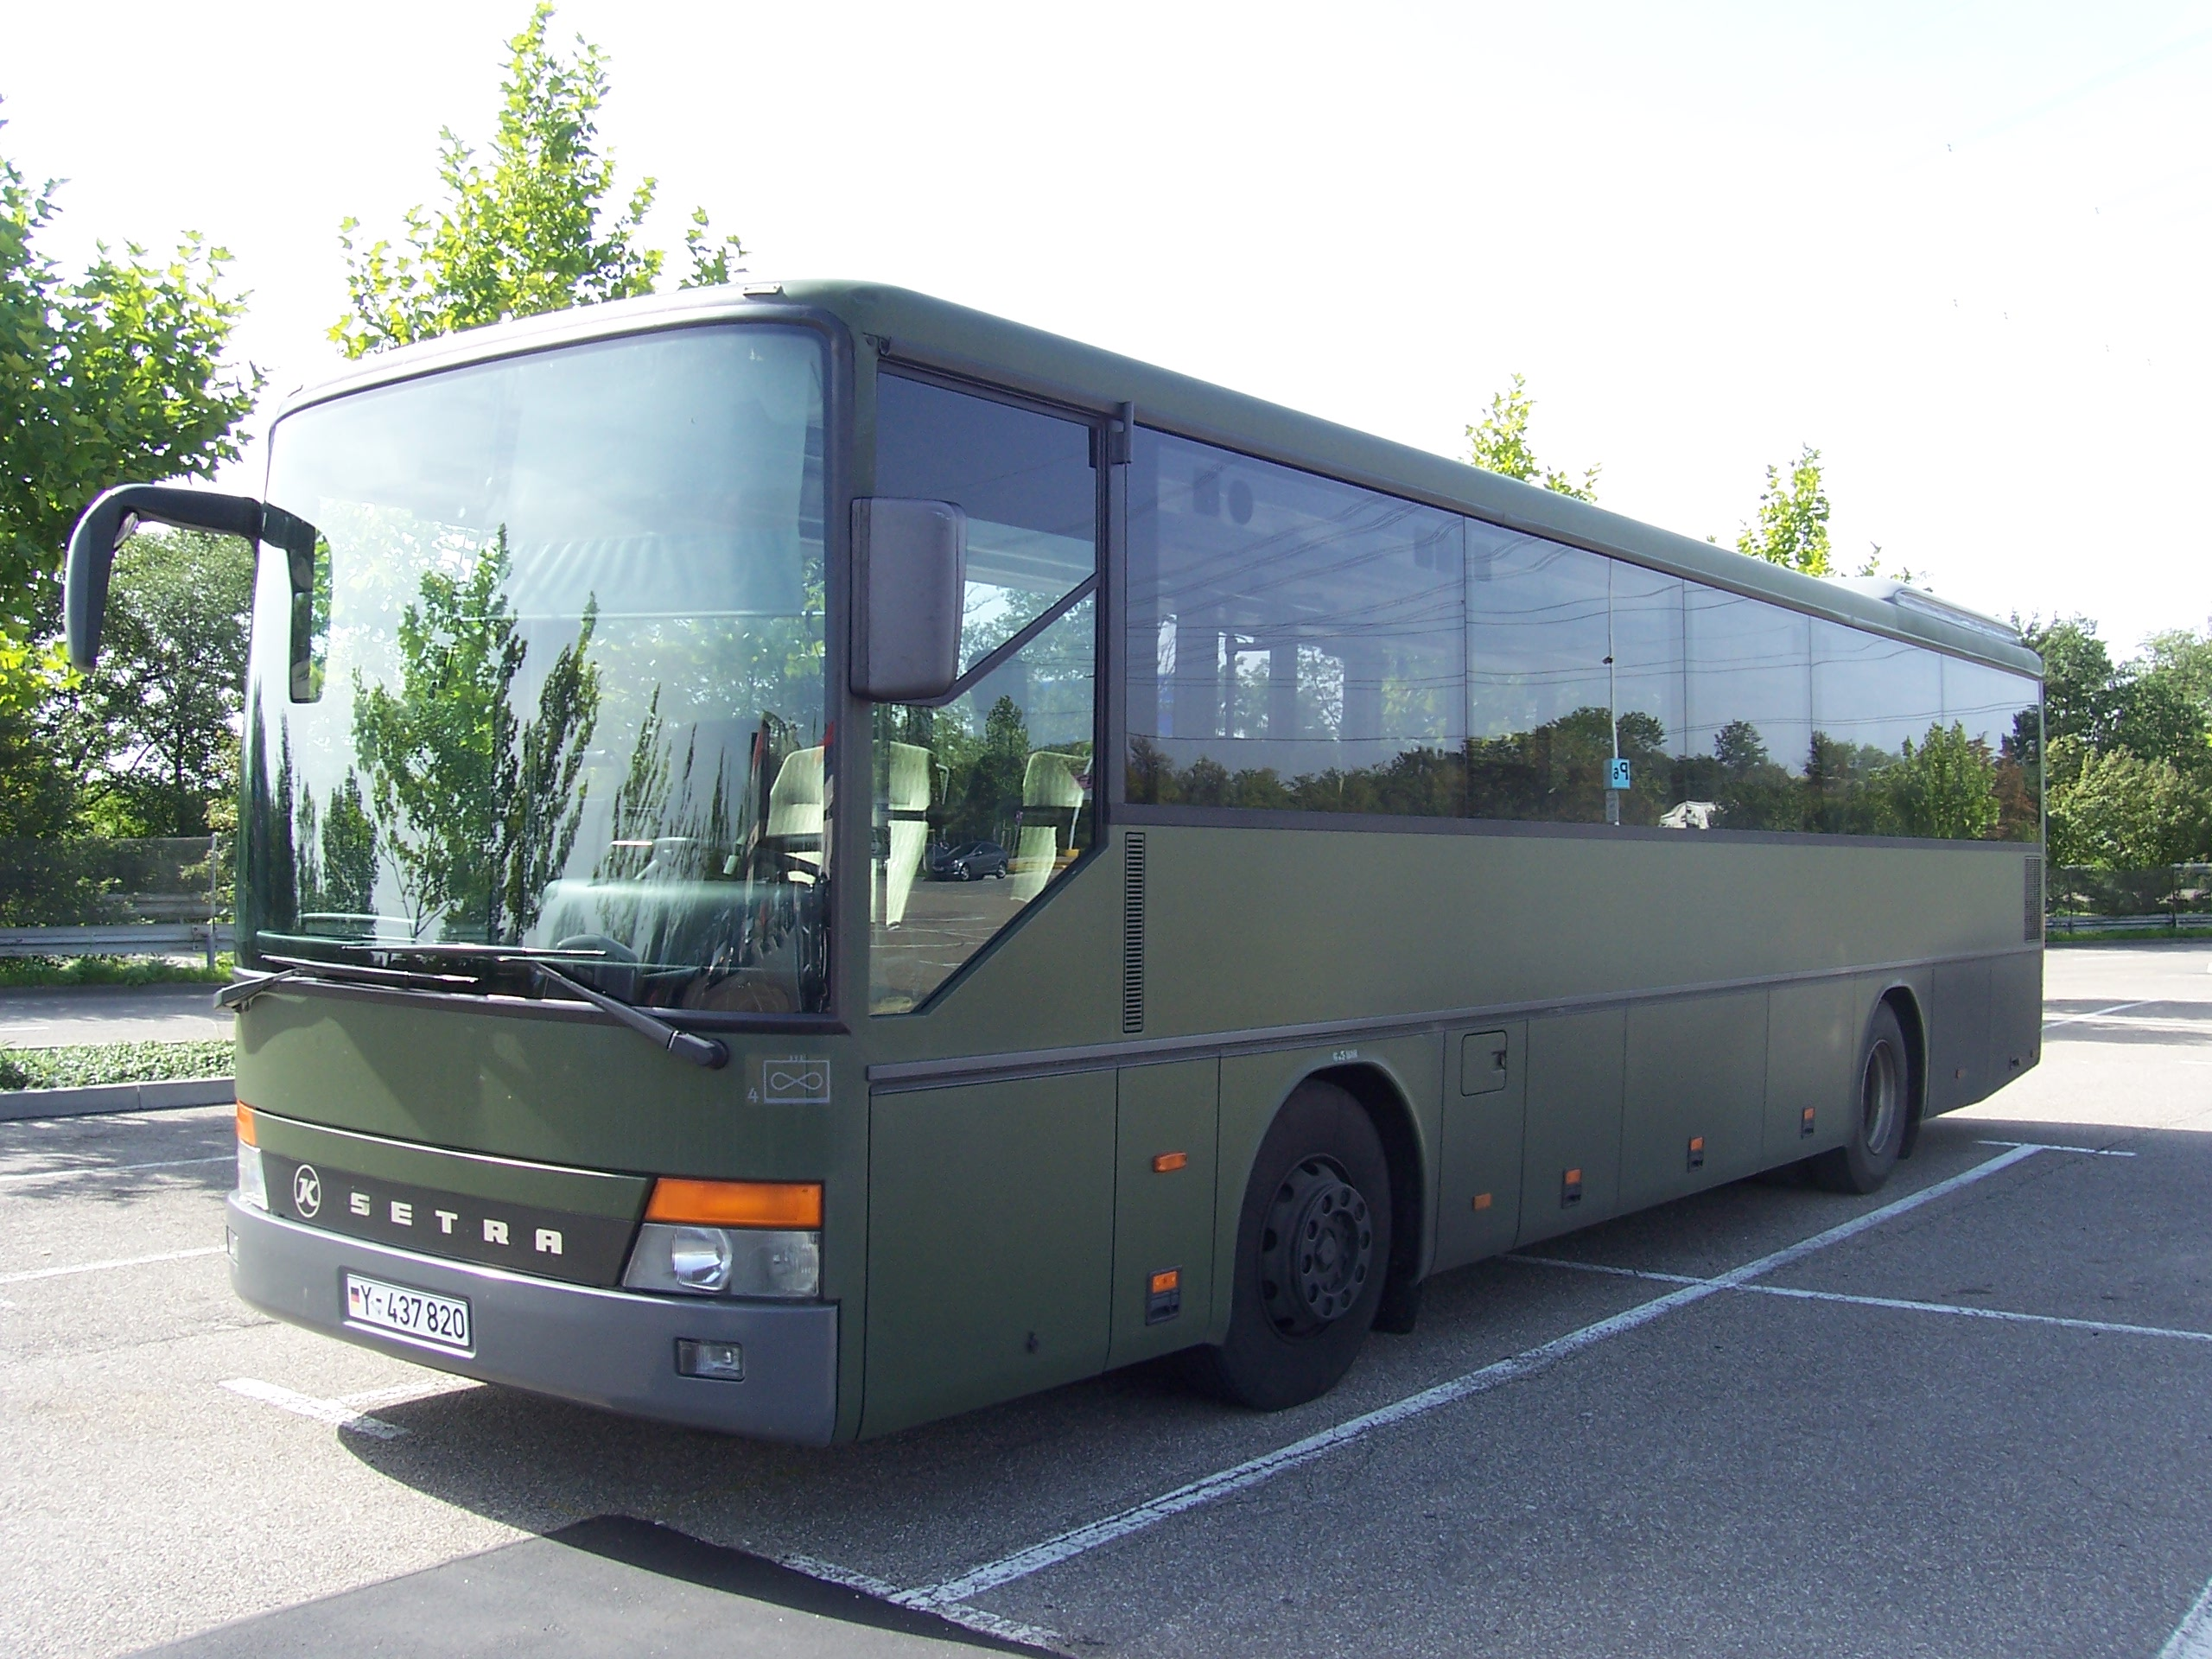 File:Setra Bus der Bundeswehr 100 7842.jpg - Wikimedia Commons